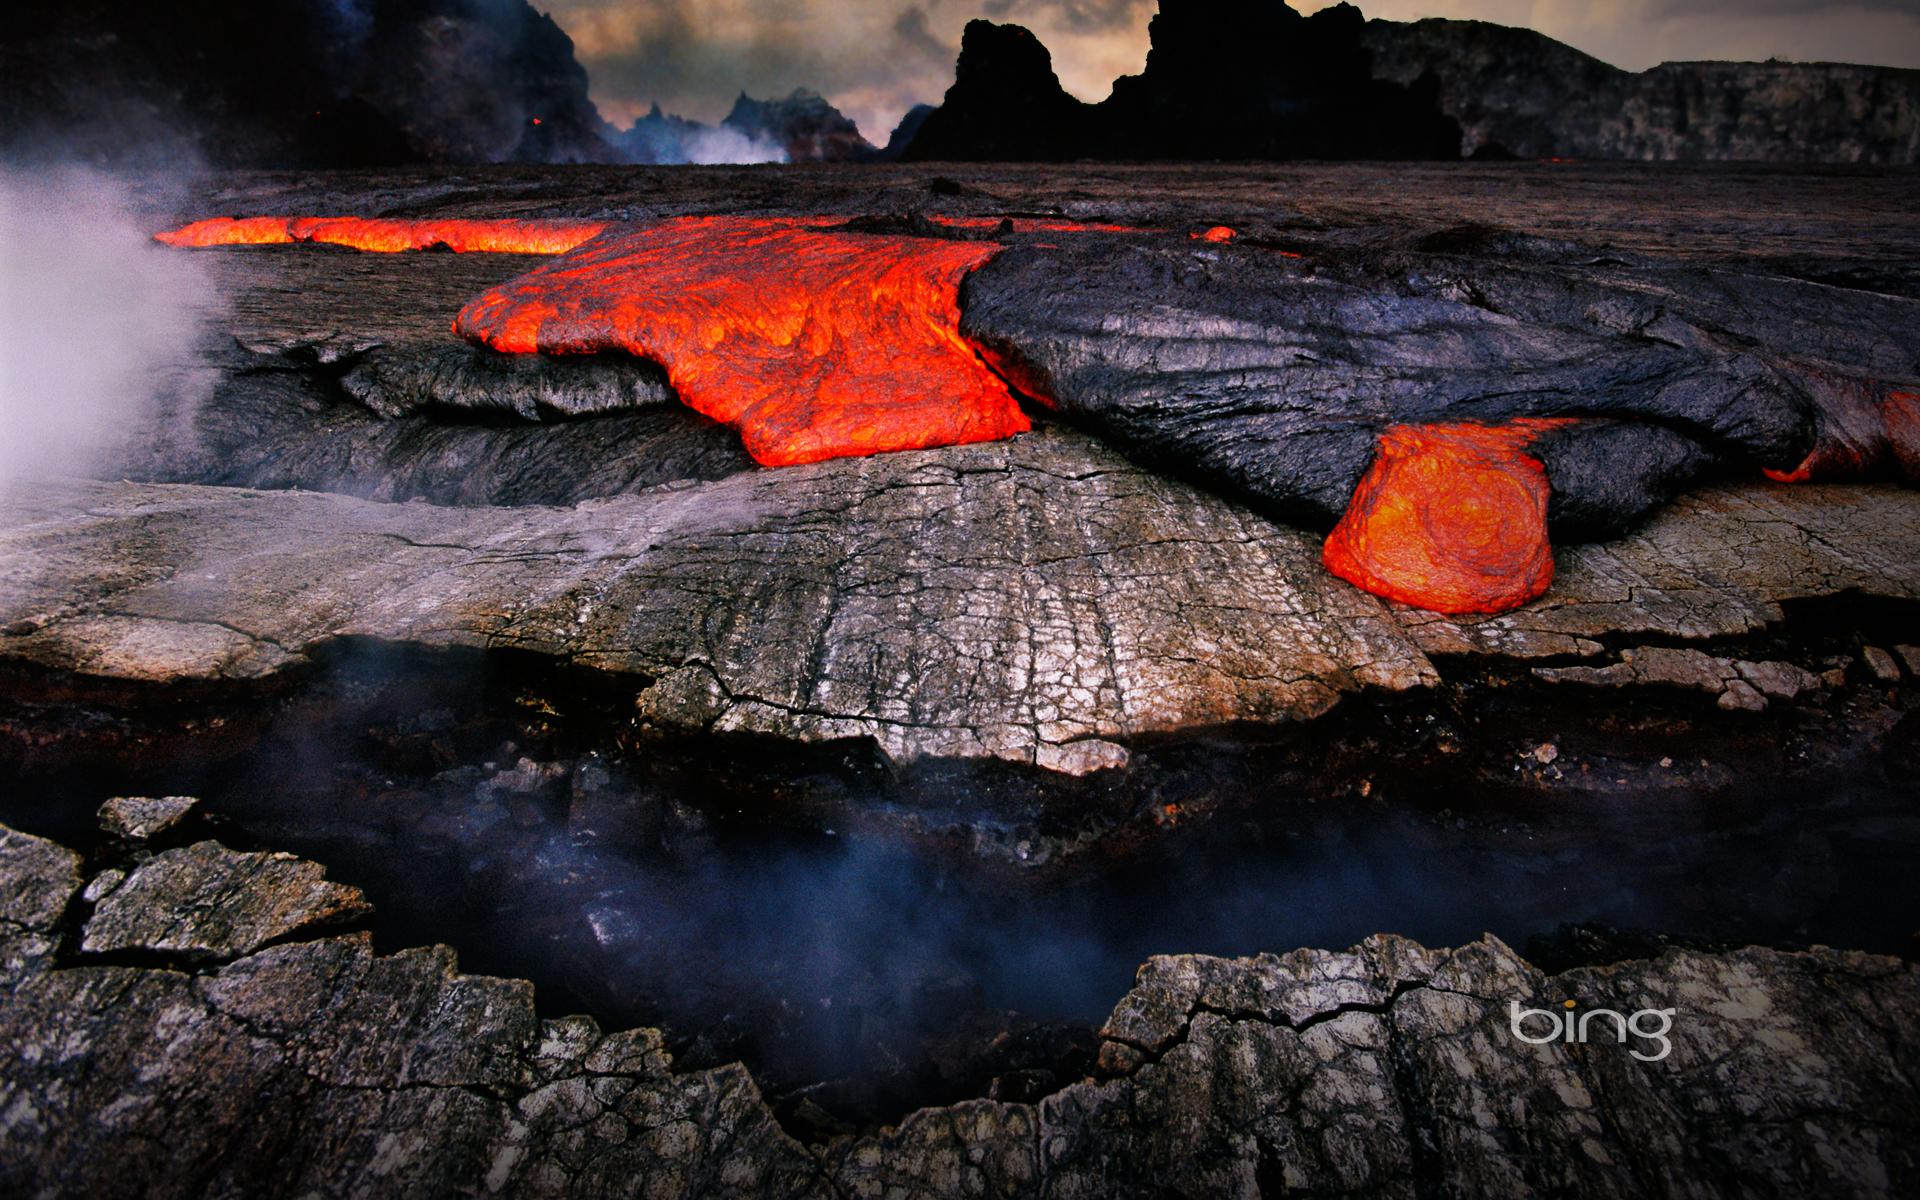 Volcano Of Bing Hawaii Lava Windowstheme Wallpaper with 19201200 1920x1200